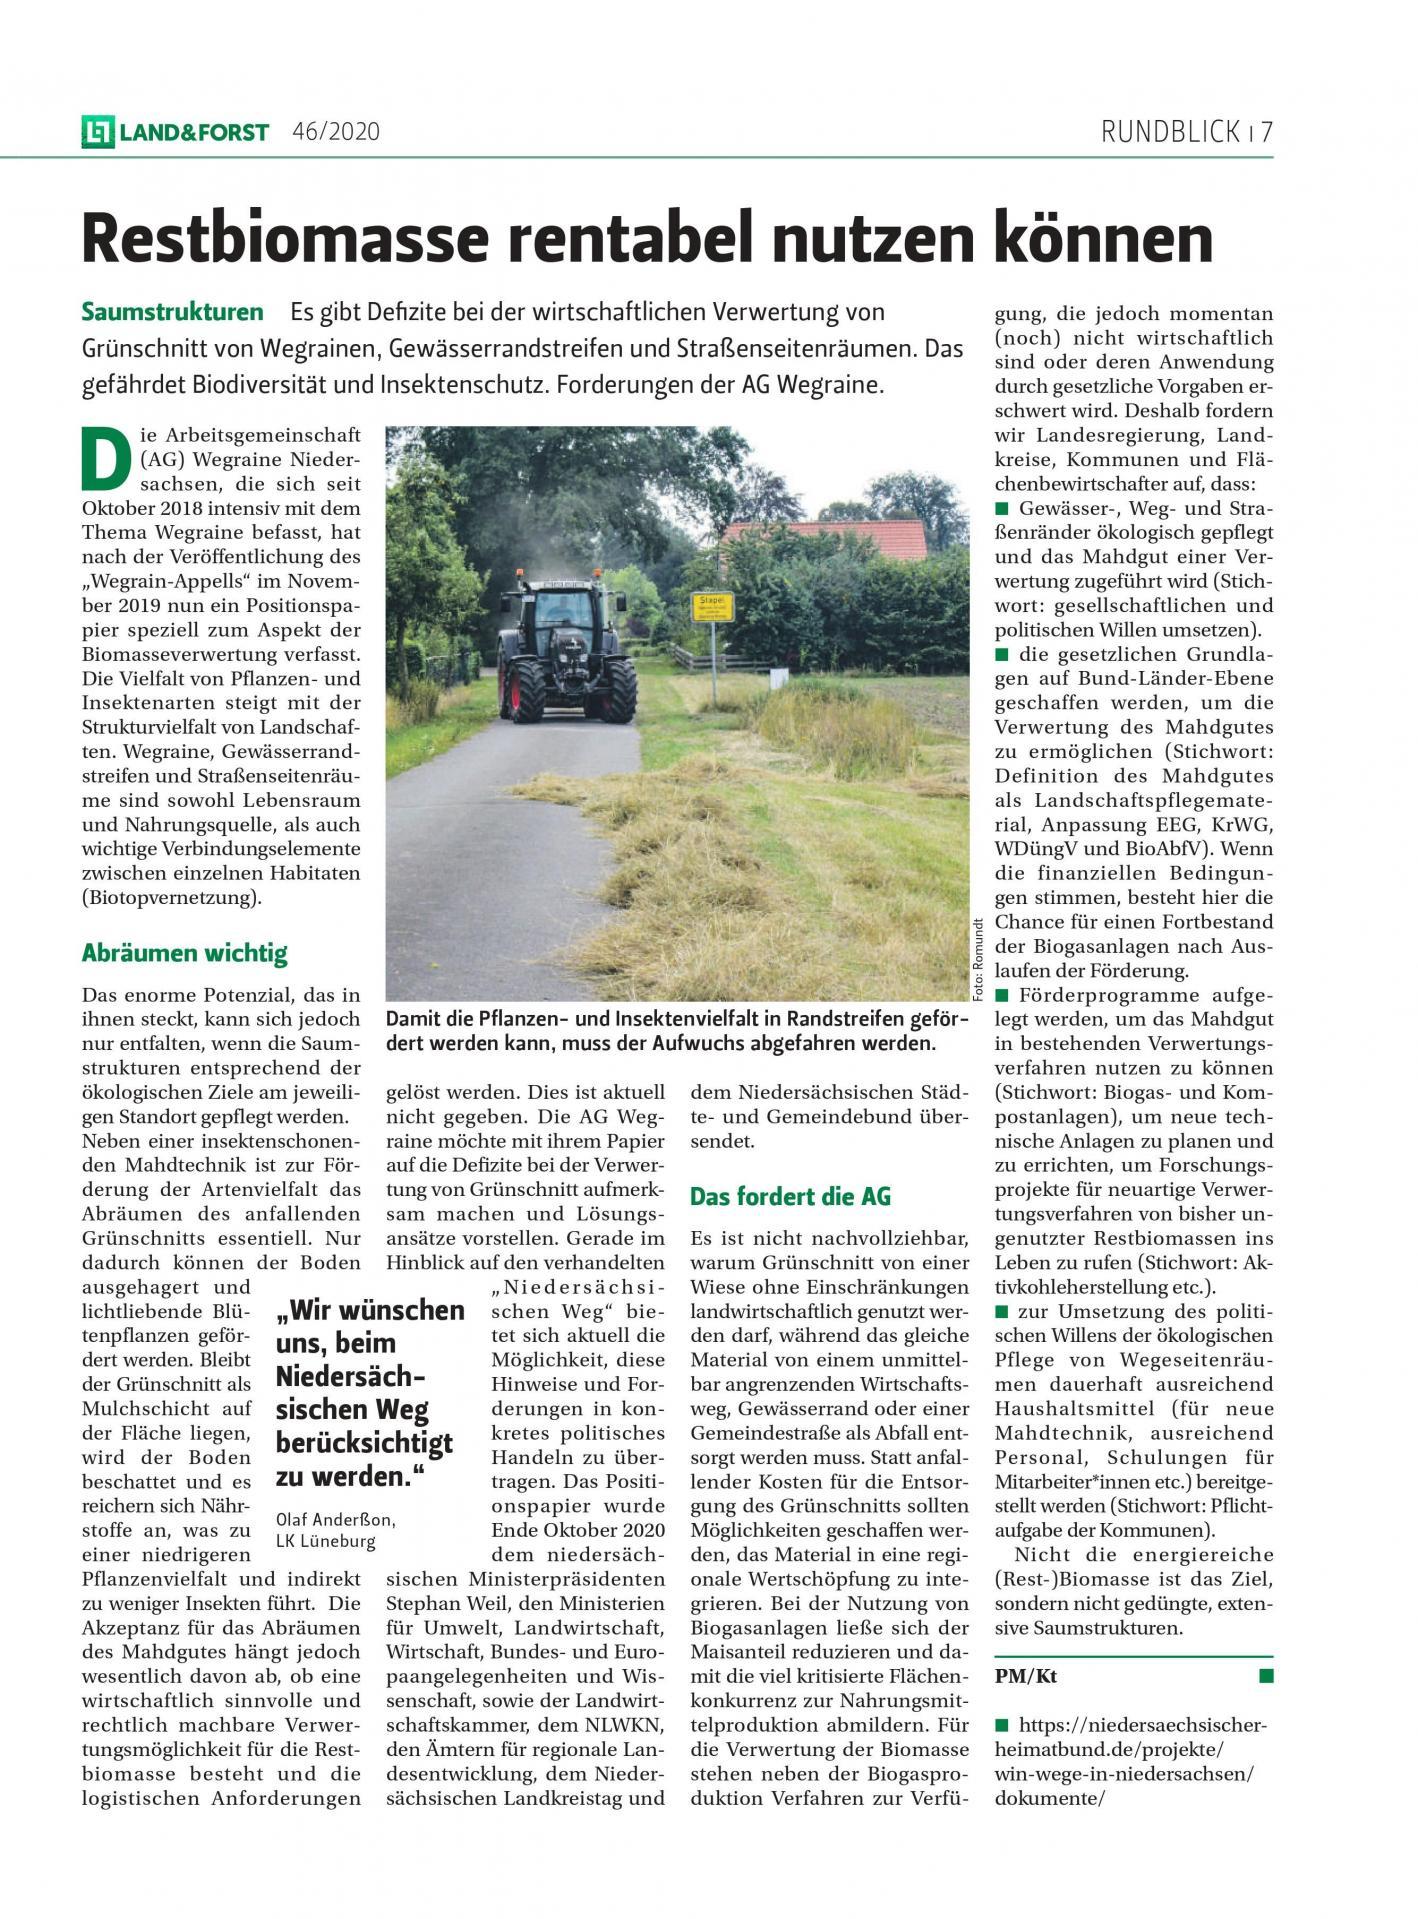 Artikel Land & Forst Positionspapier Ausgabe 46/2020